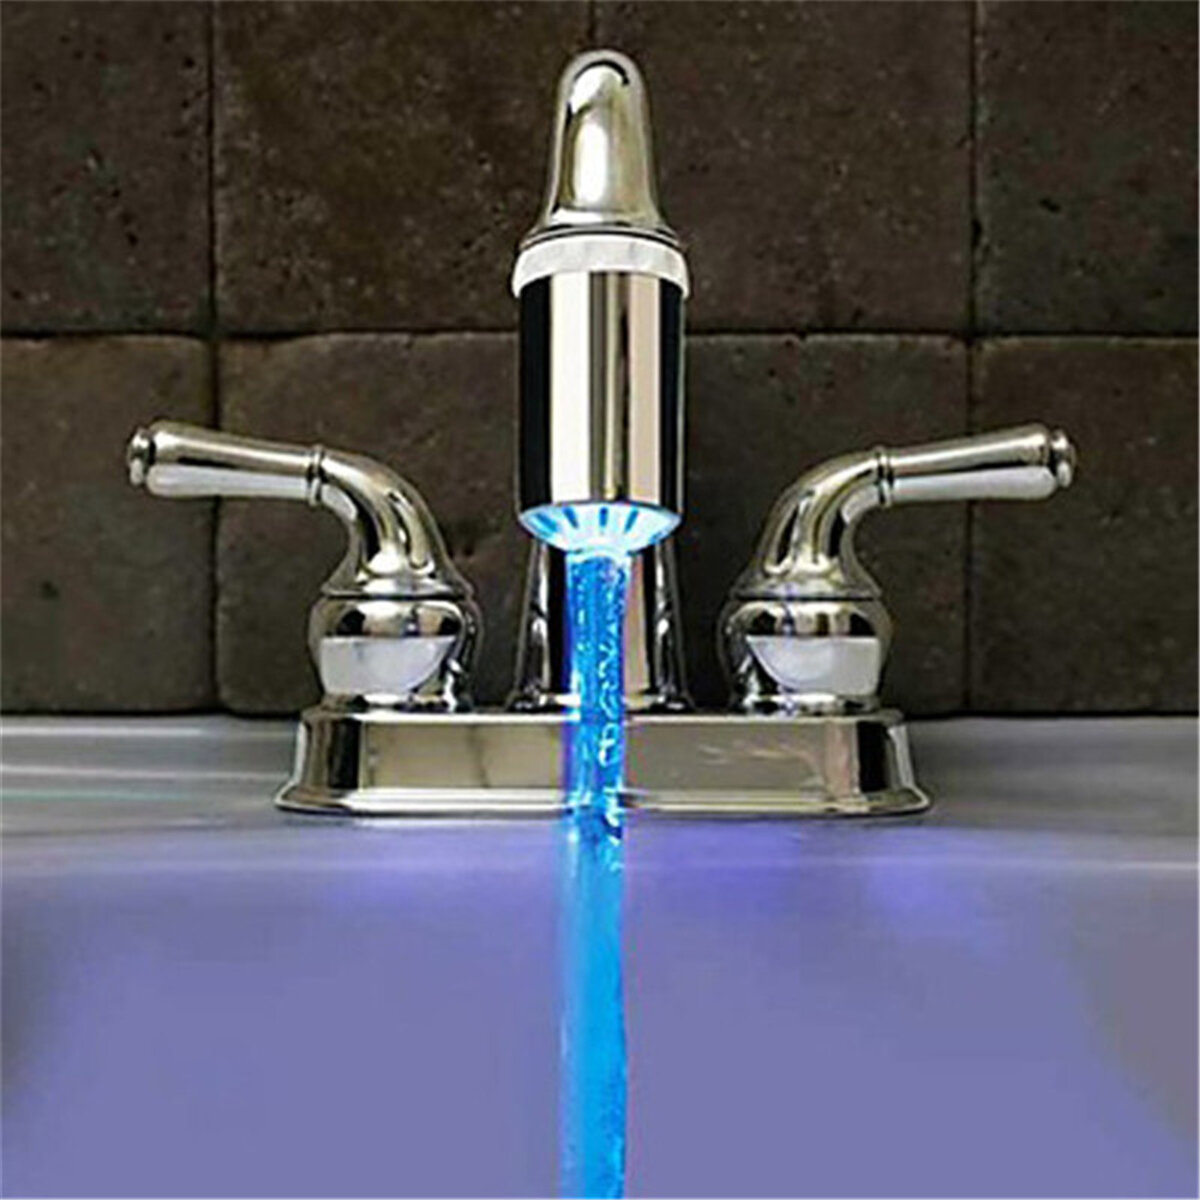 Professional Sale 3 Color Led Light Change Faucet Shower Water Tap Temperature Sensor No Battery Water Faucet Glow Bathroom Shower Faucet Home Appliance Parts Water Filter Parts